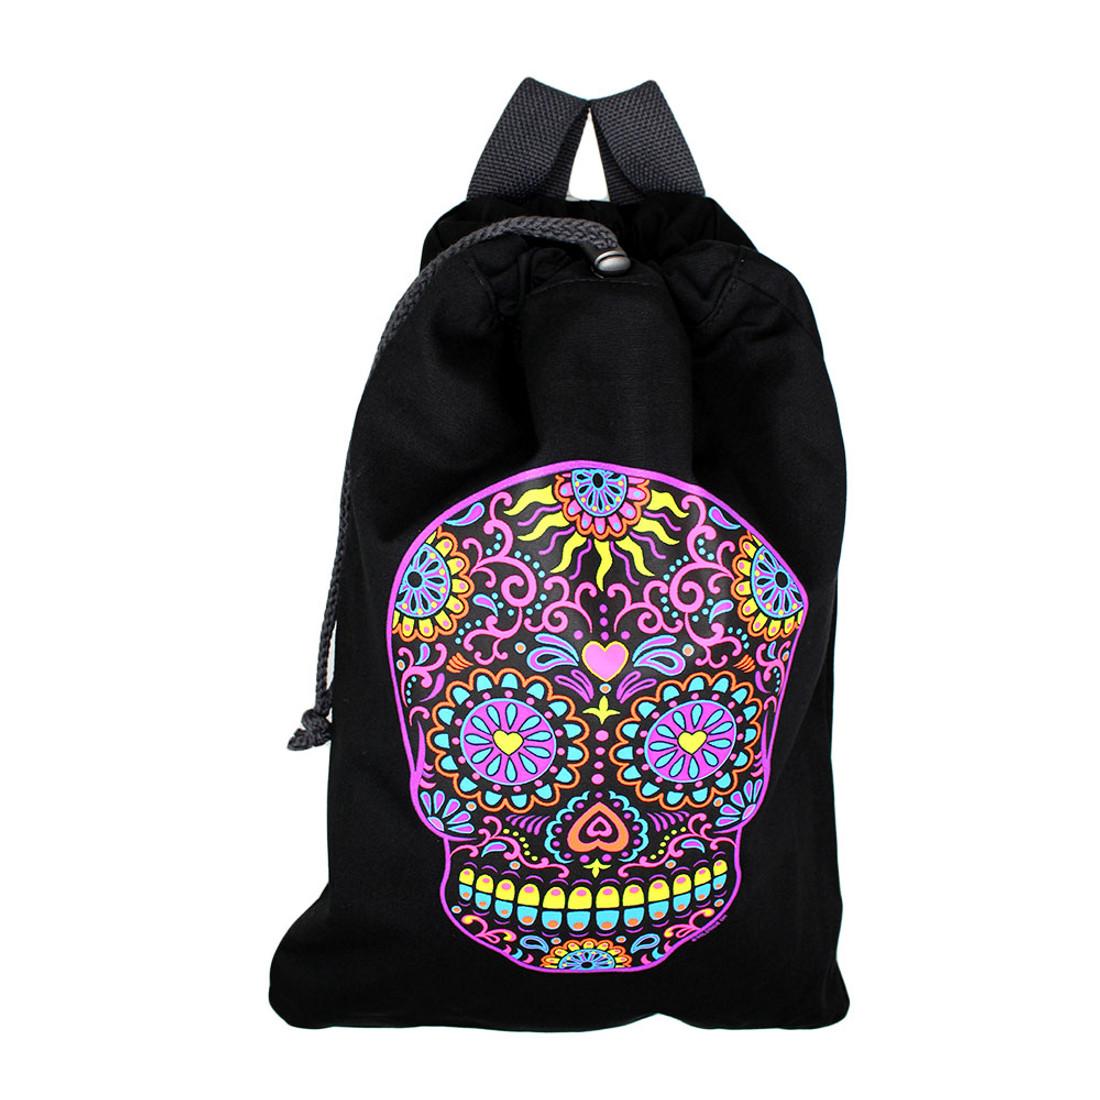 Colorful bright sugar skull  backpack purse.